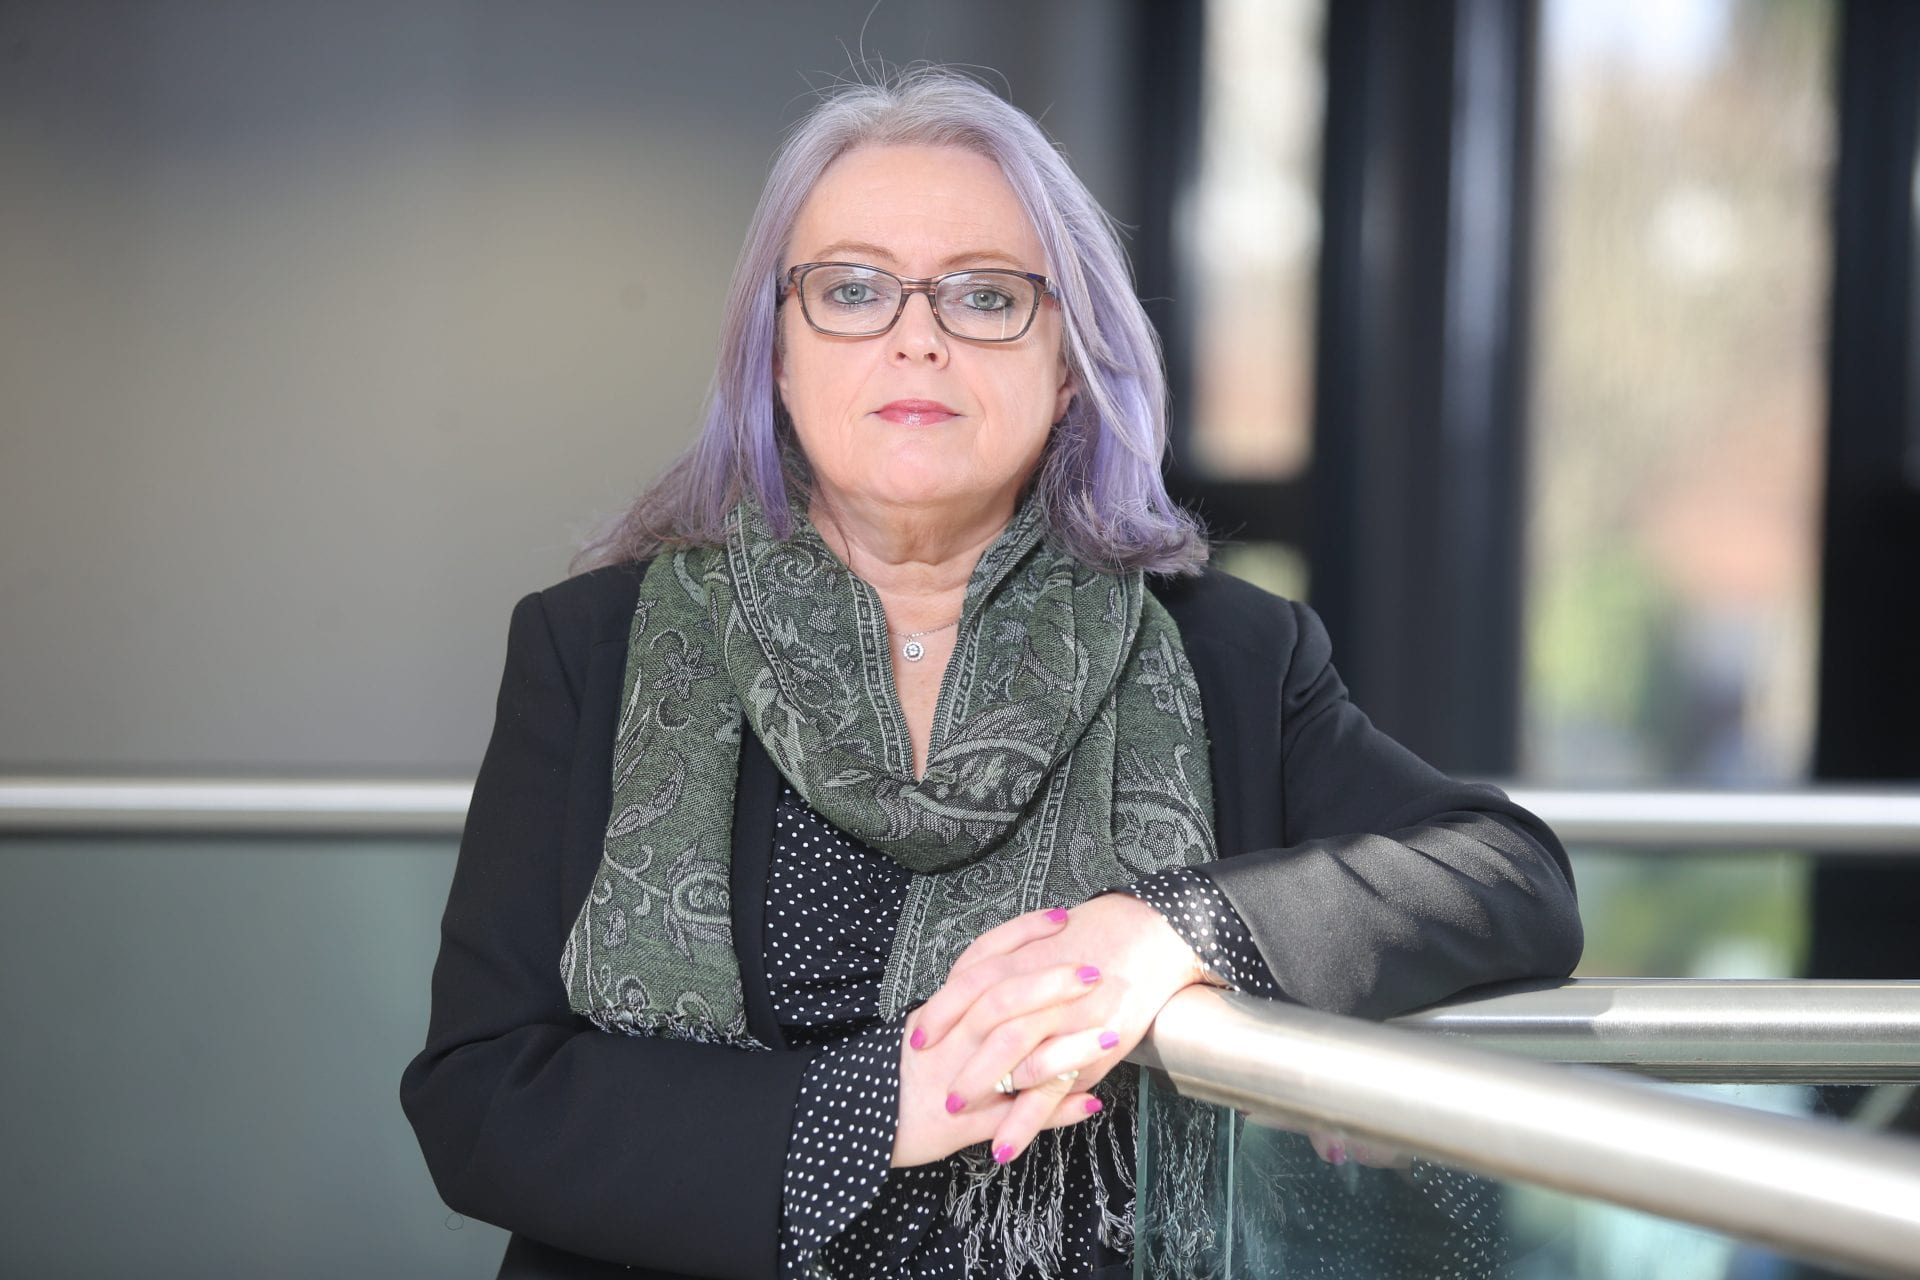 Eileen Patterson